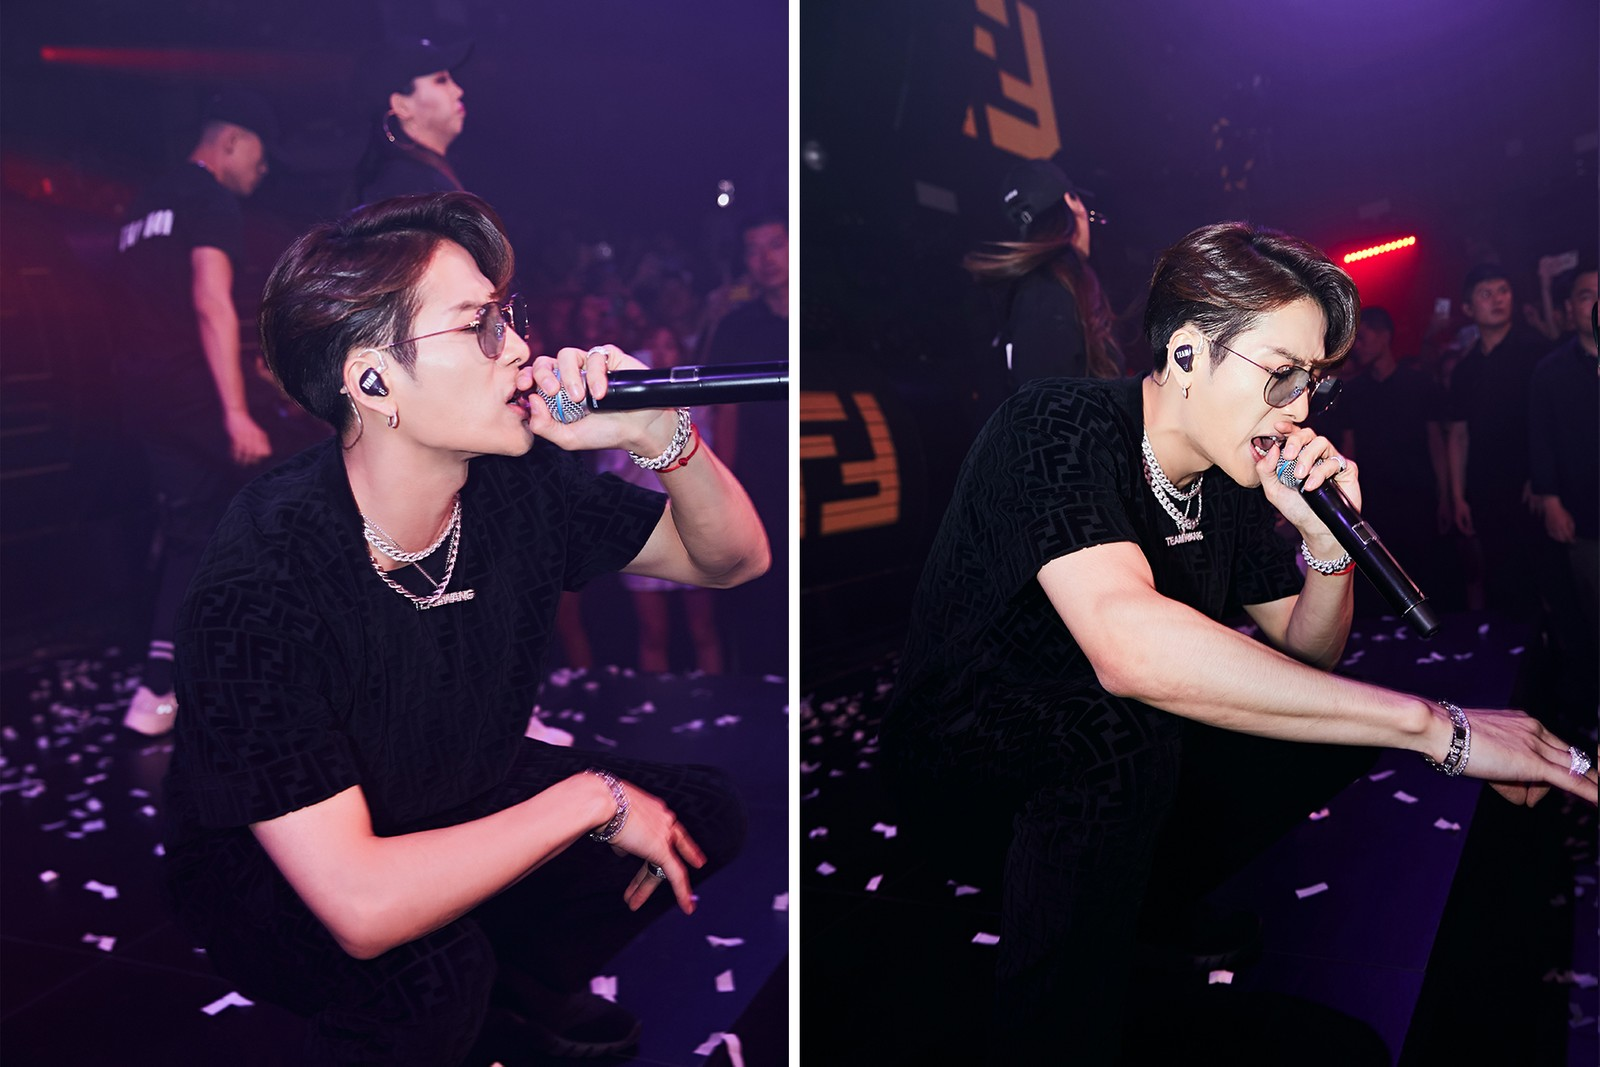 FENDI x Jackson Wang 聯乘企劃音樂派對回顧!